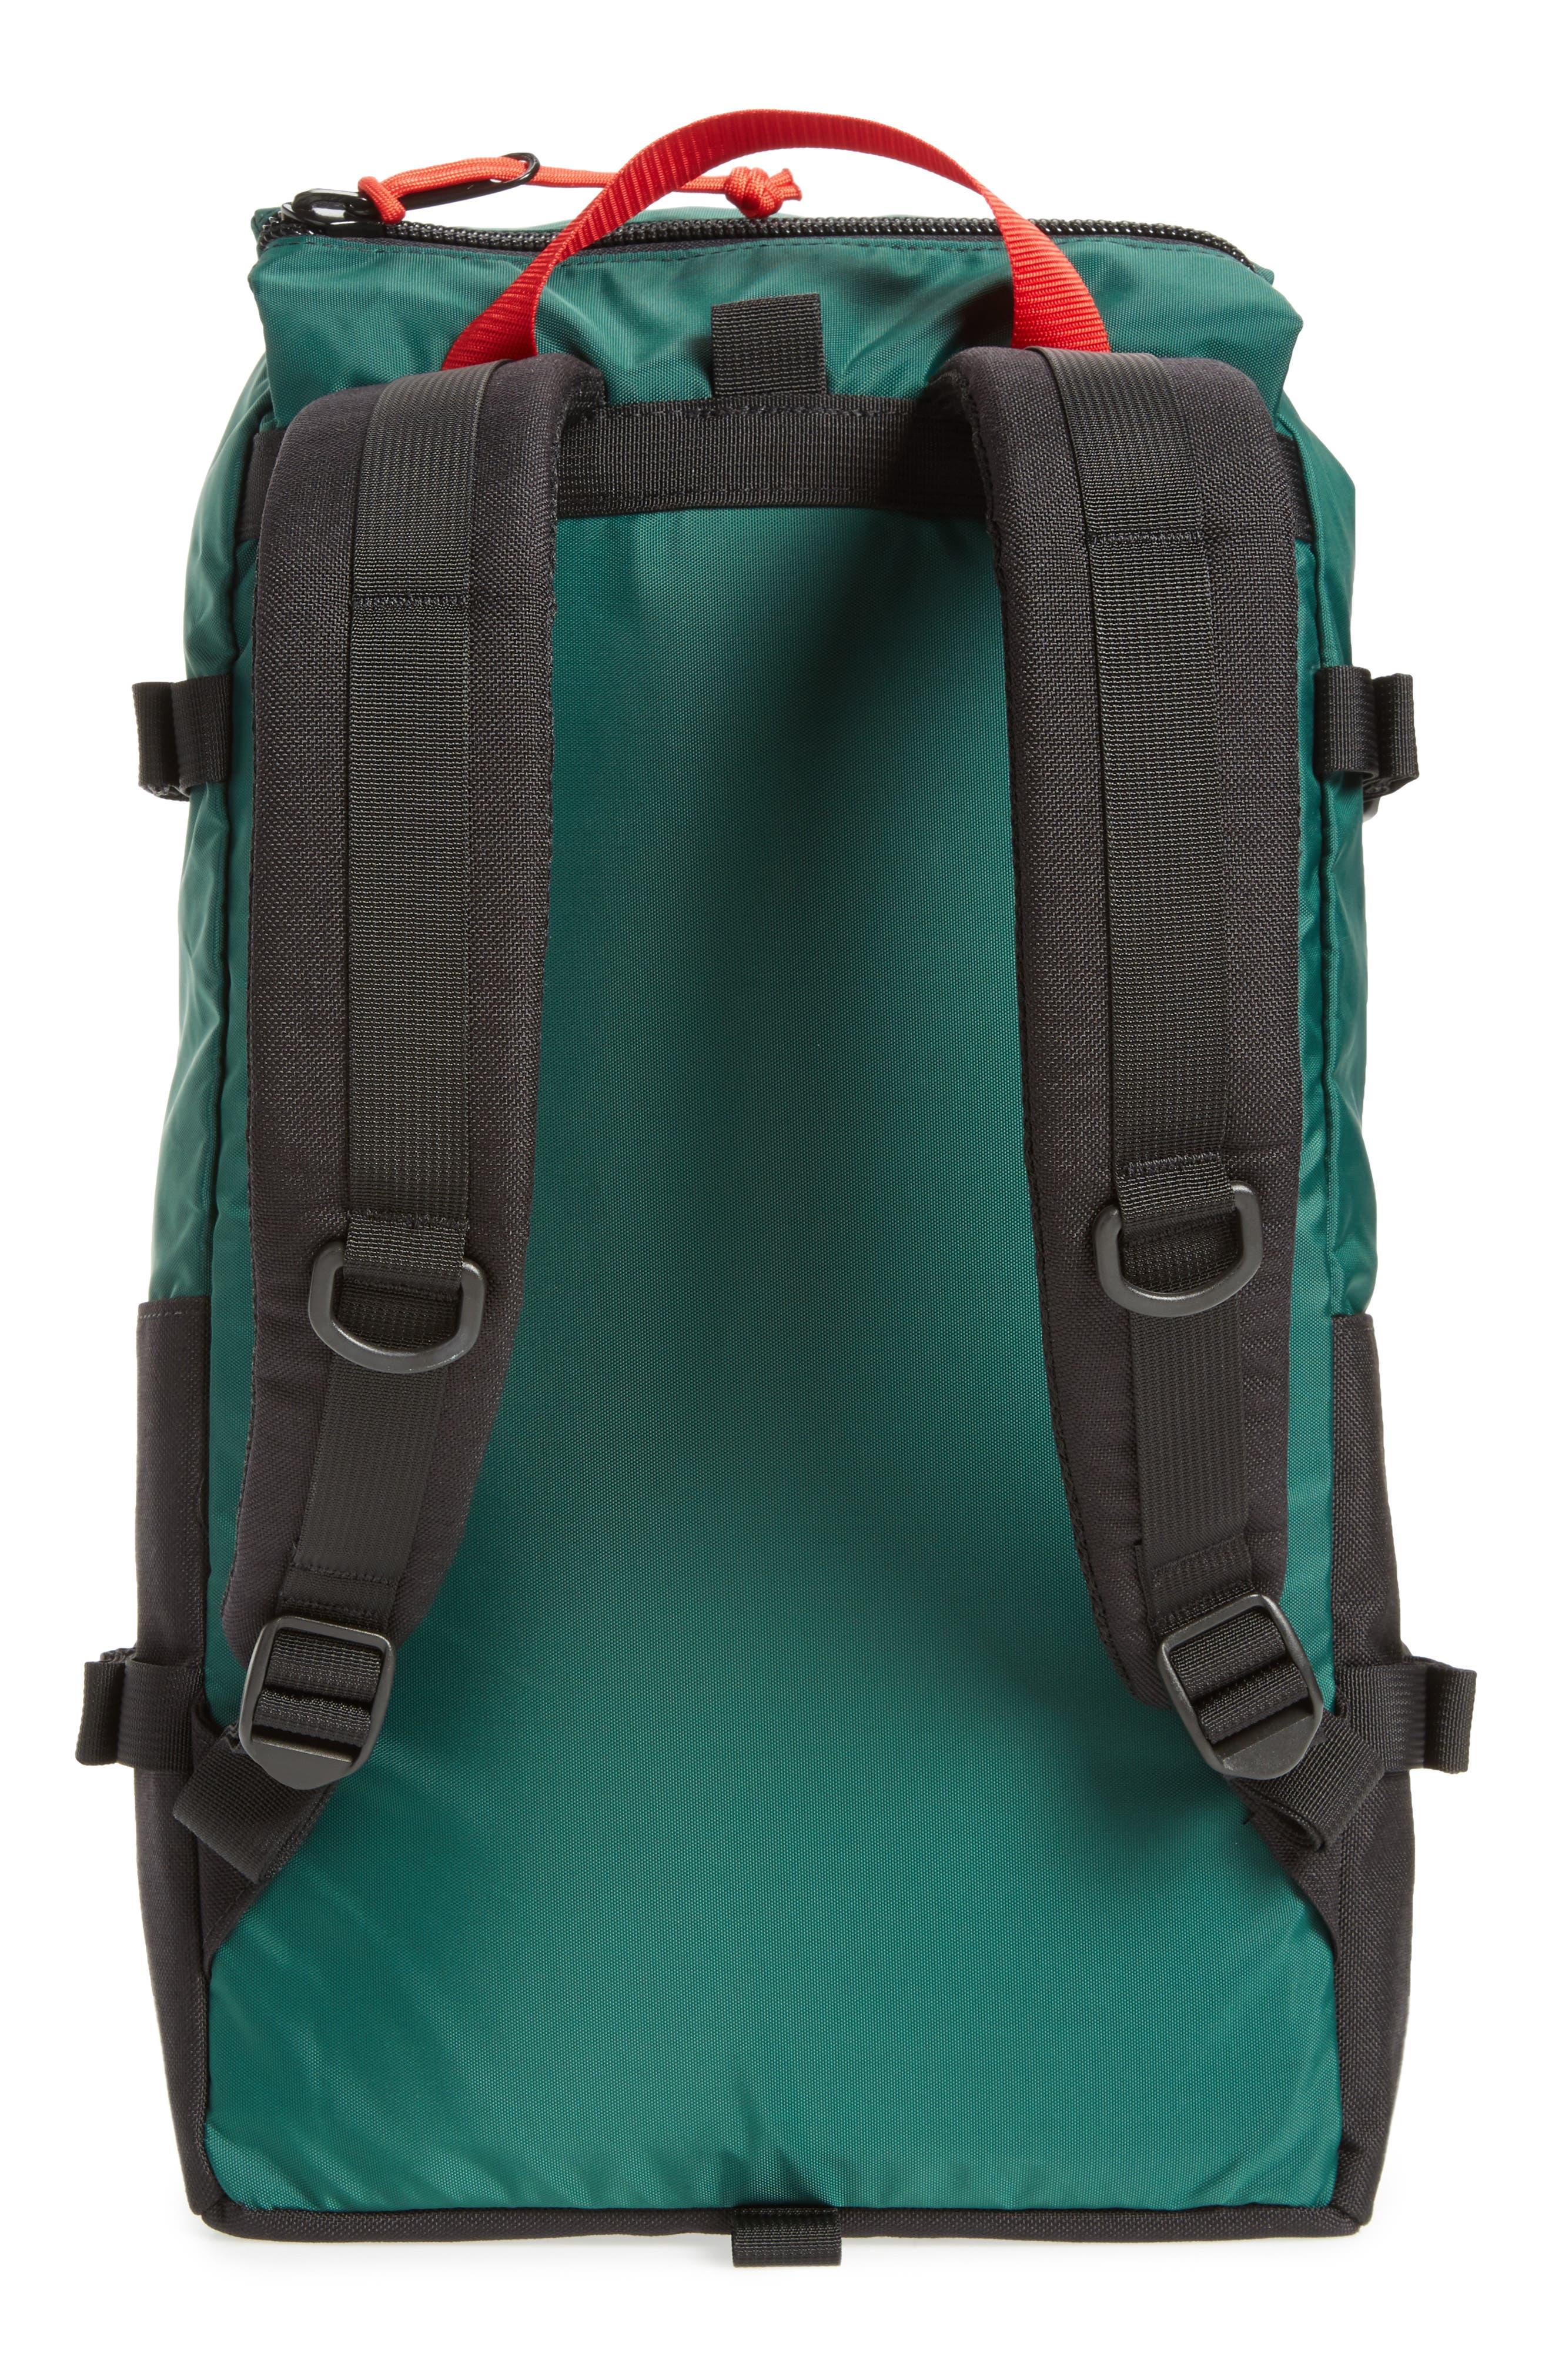 Rover Backpack,                             Alternate thumbnail 3, color,                             FOREST/ BLACK